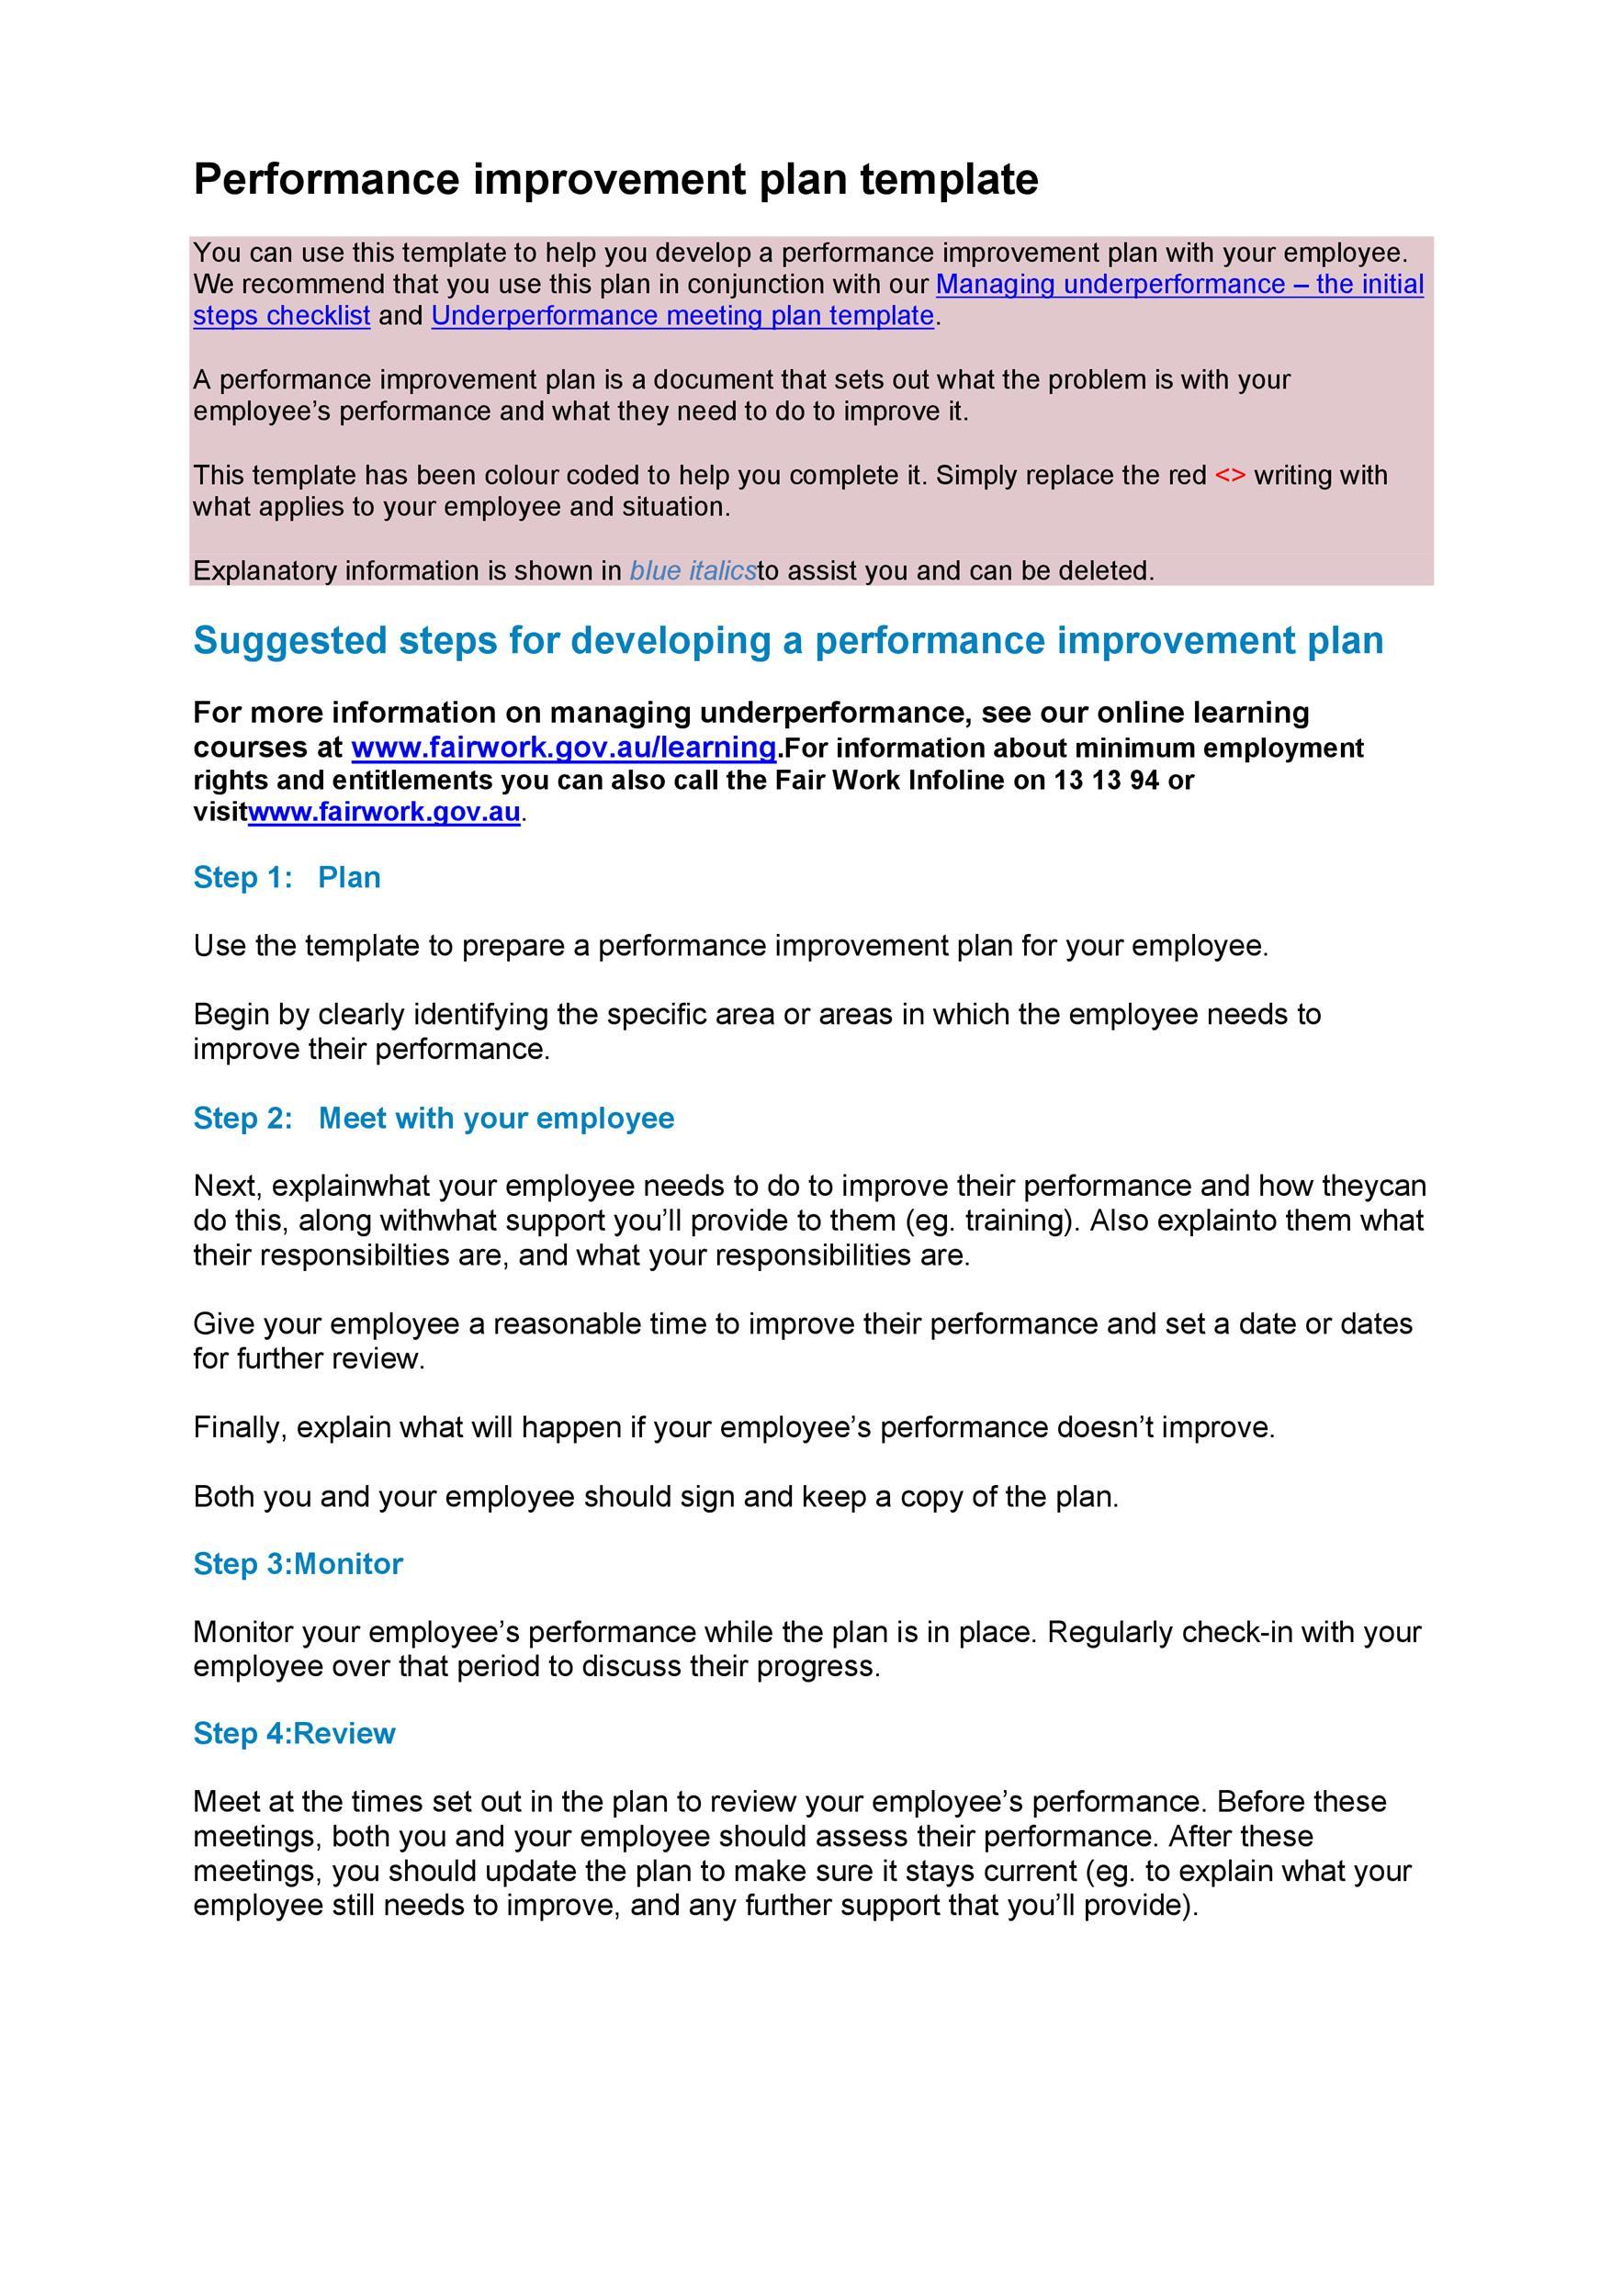 Free performance improvement plan template 24